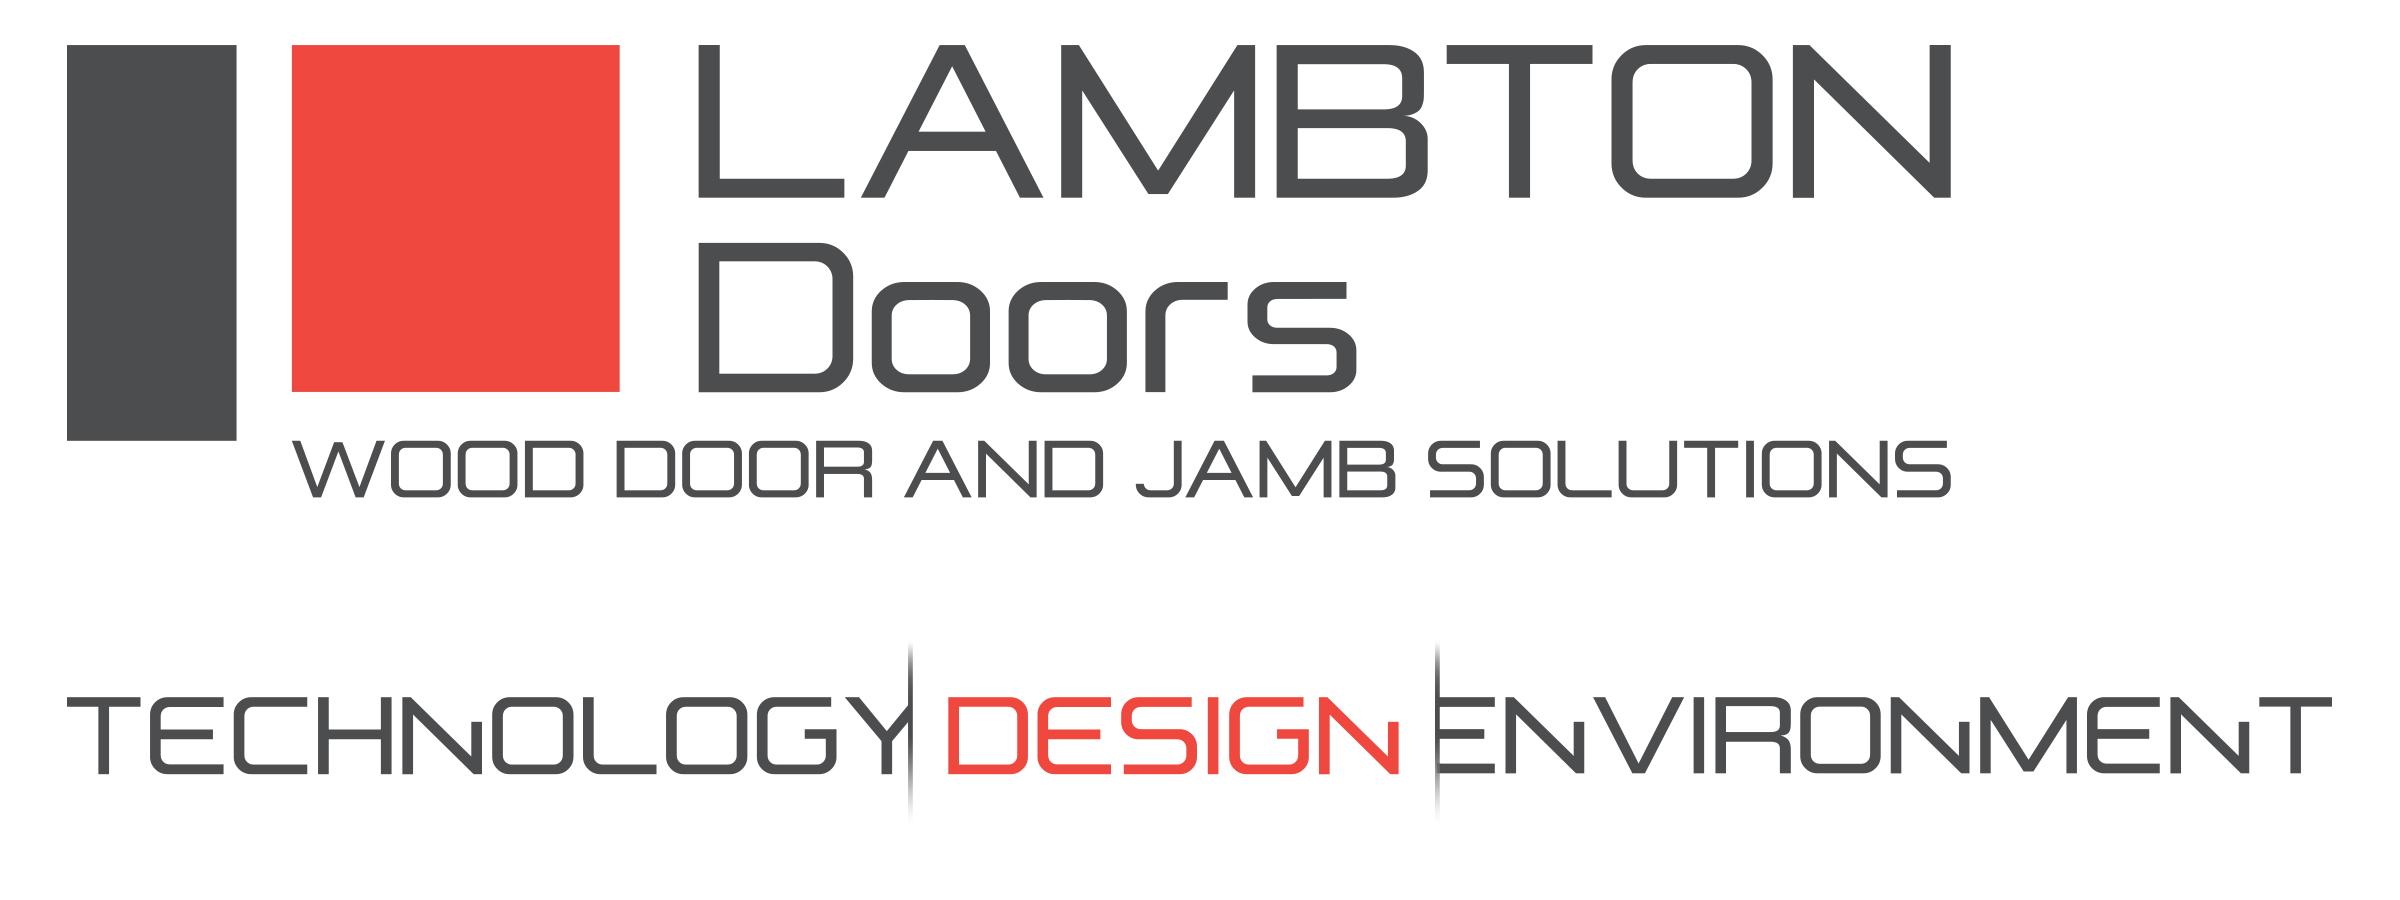 LAMBTON_DOORS_Logo_2016